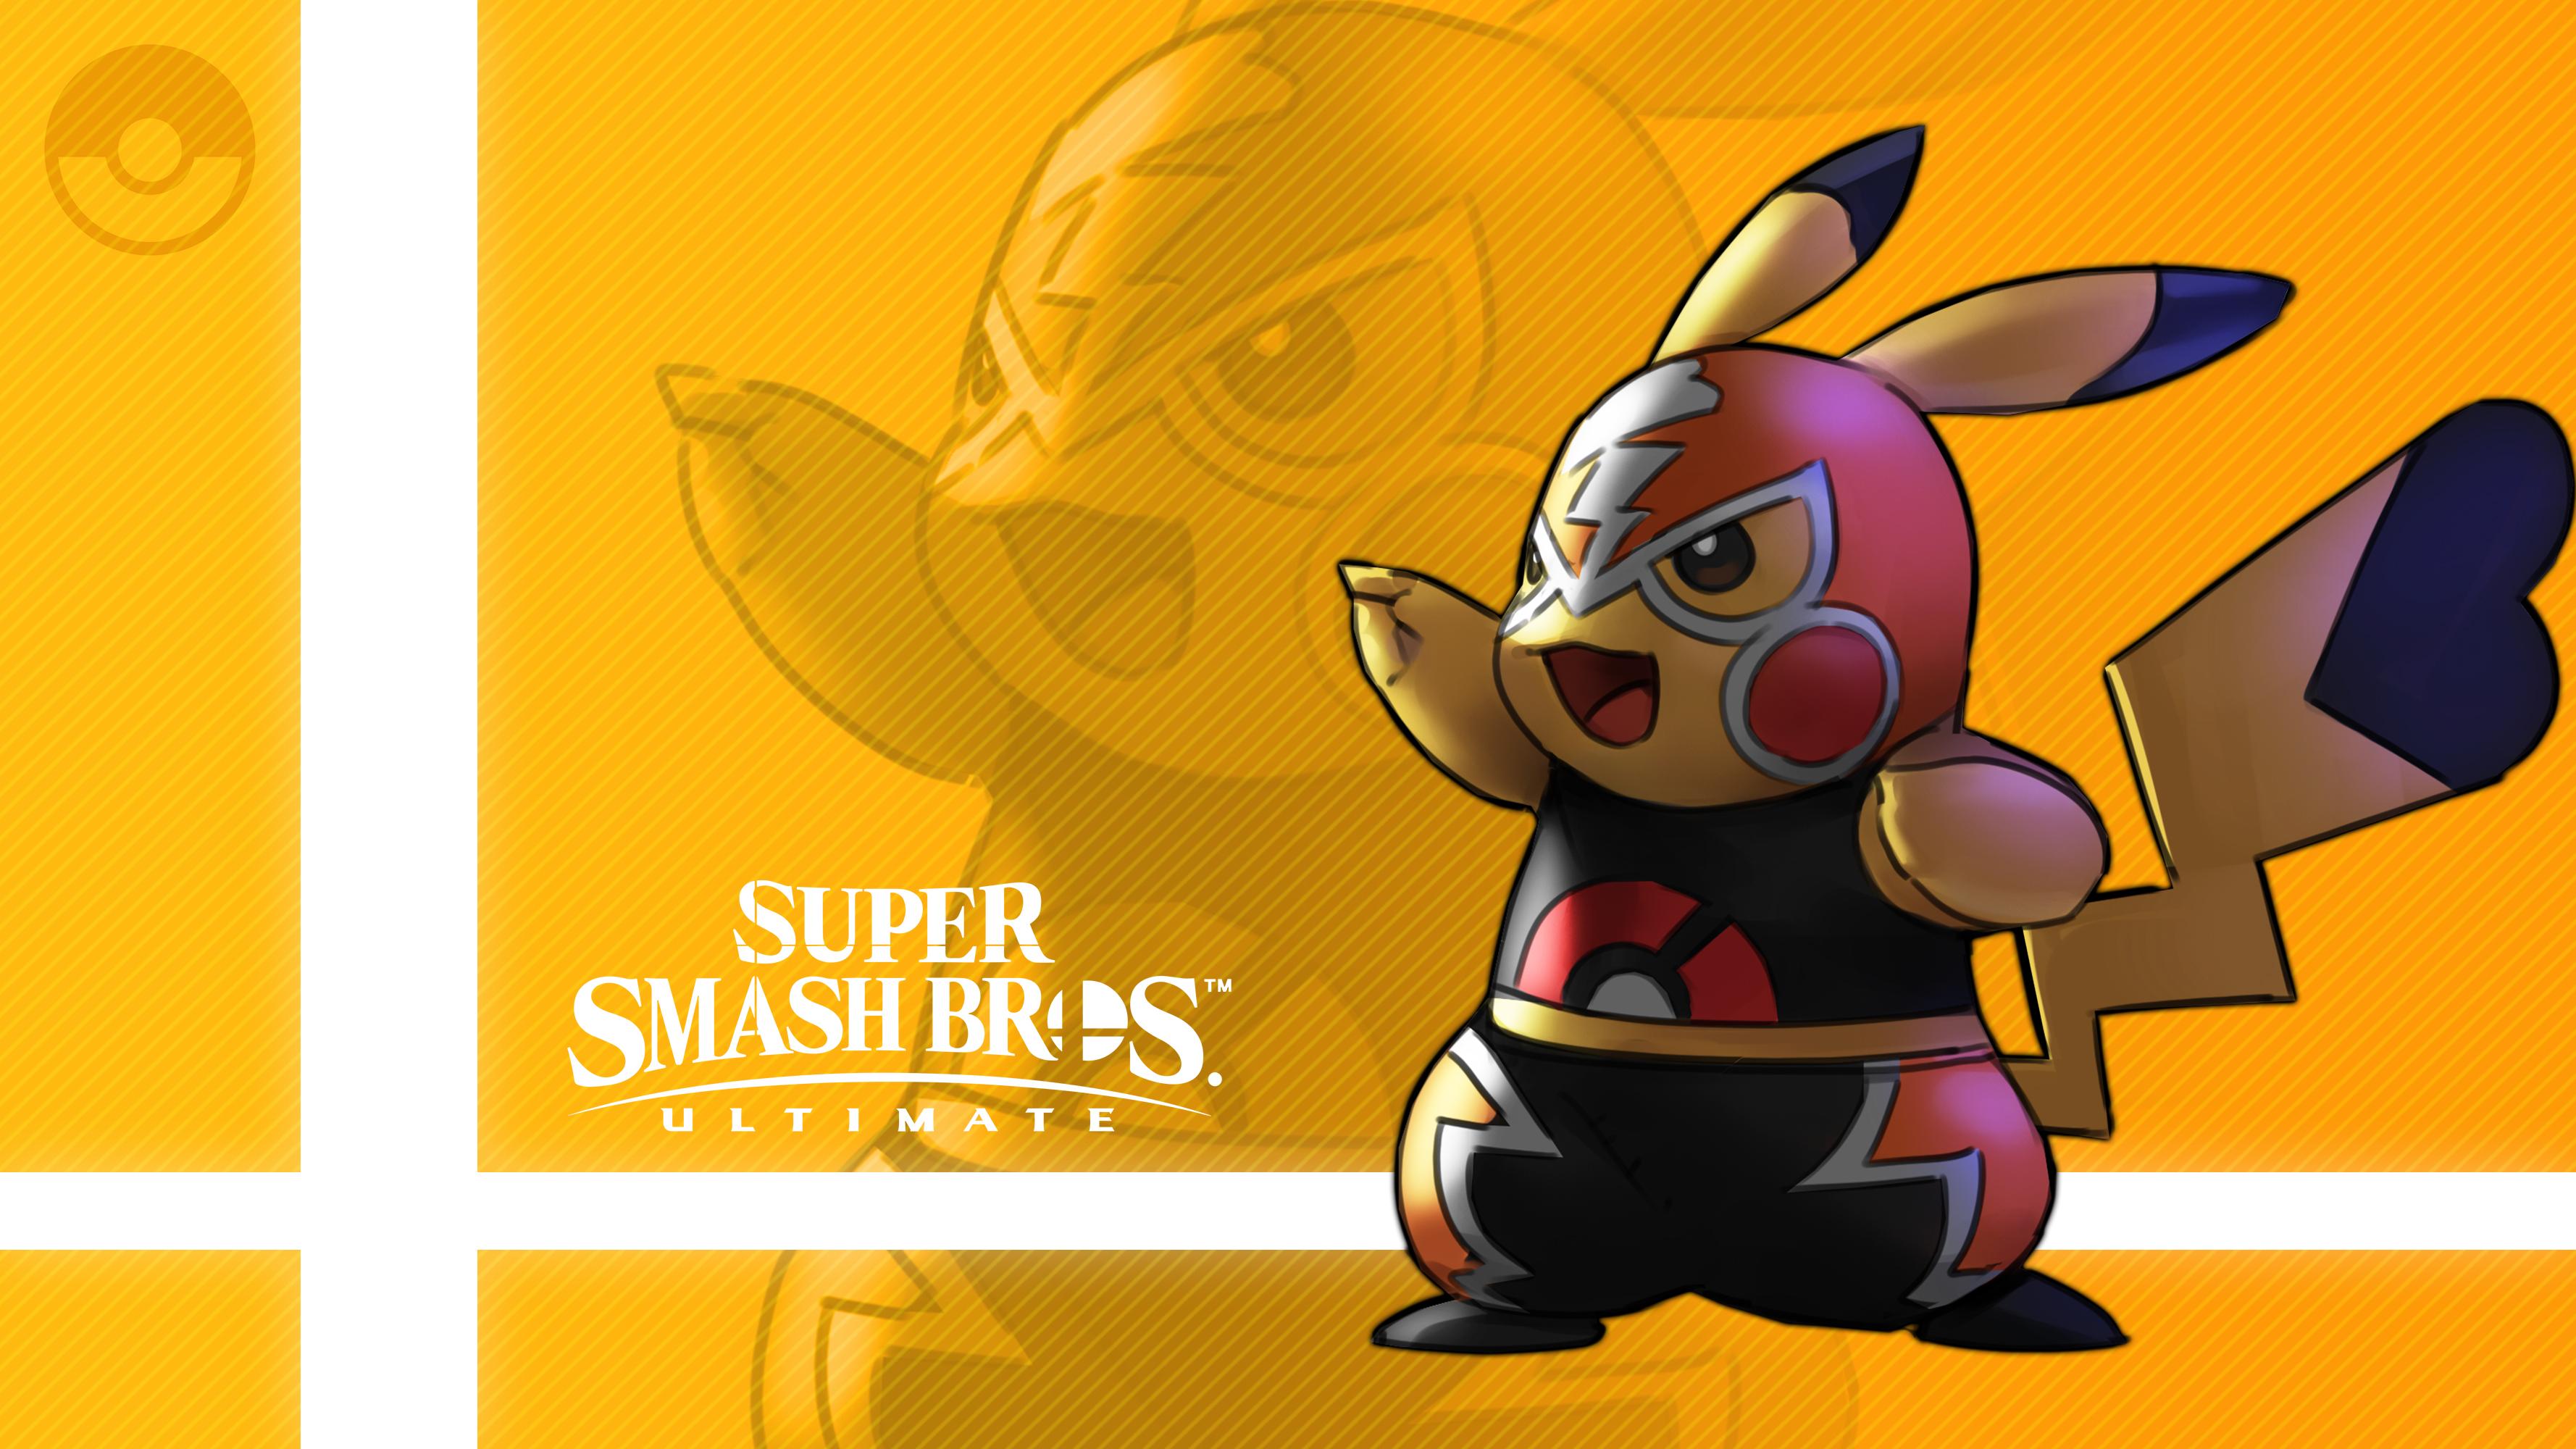 Pikachu Libre In Super Smash Bros. Ultimate HD Wallpaper ...